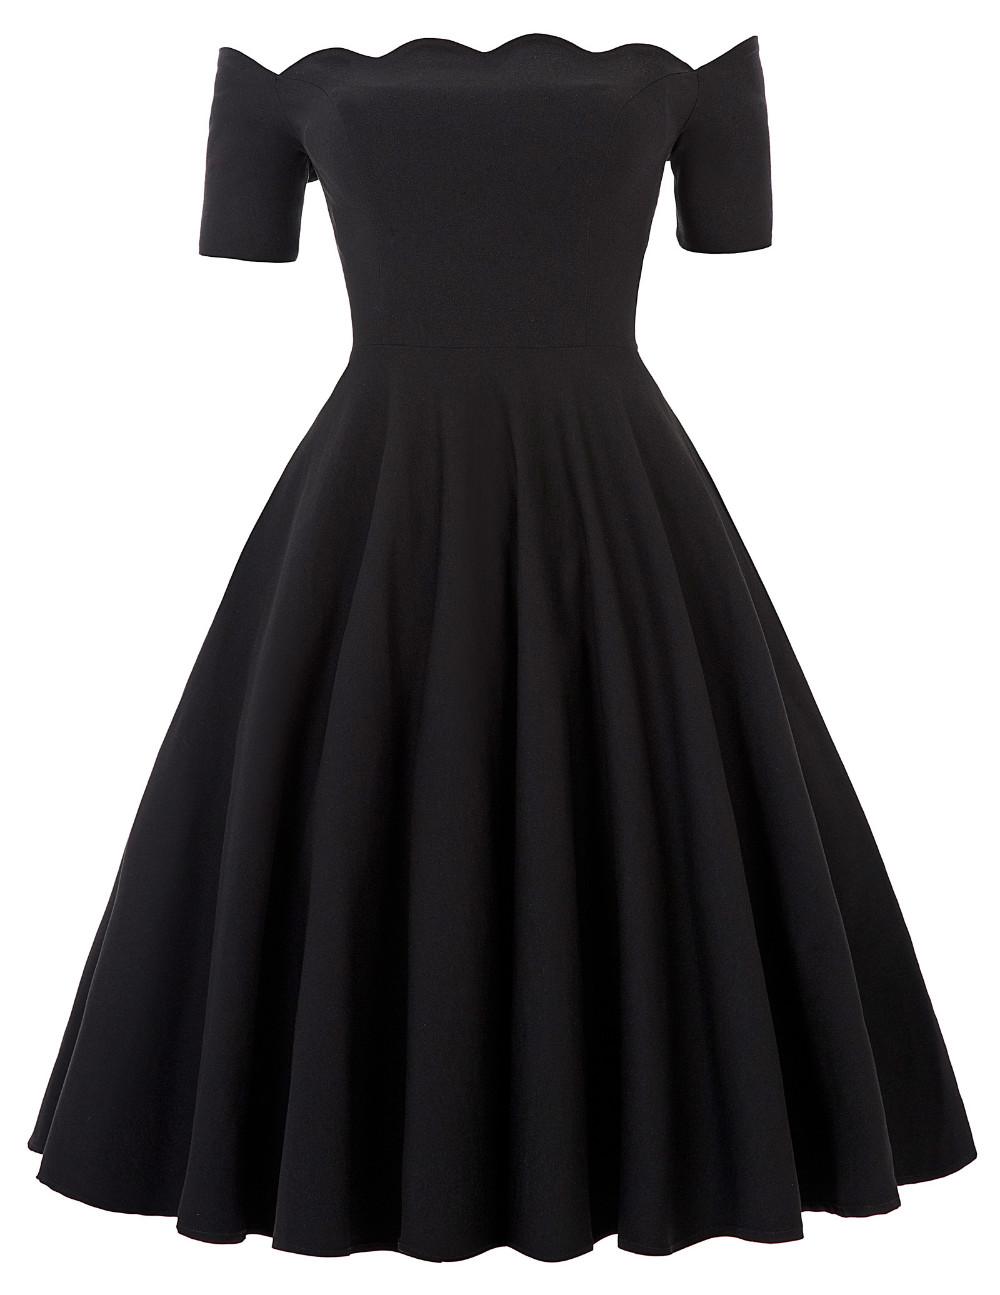 Belle Poque 17 Women Dress Robe Vintage Off Shoulder Black Summer Dress Jurken 1950s 60s Retro Rockabilly Swing Party Dresses 11